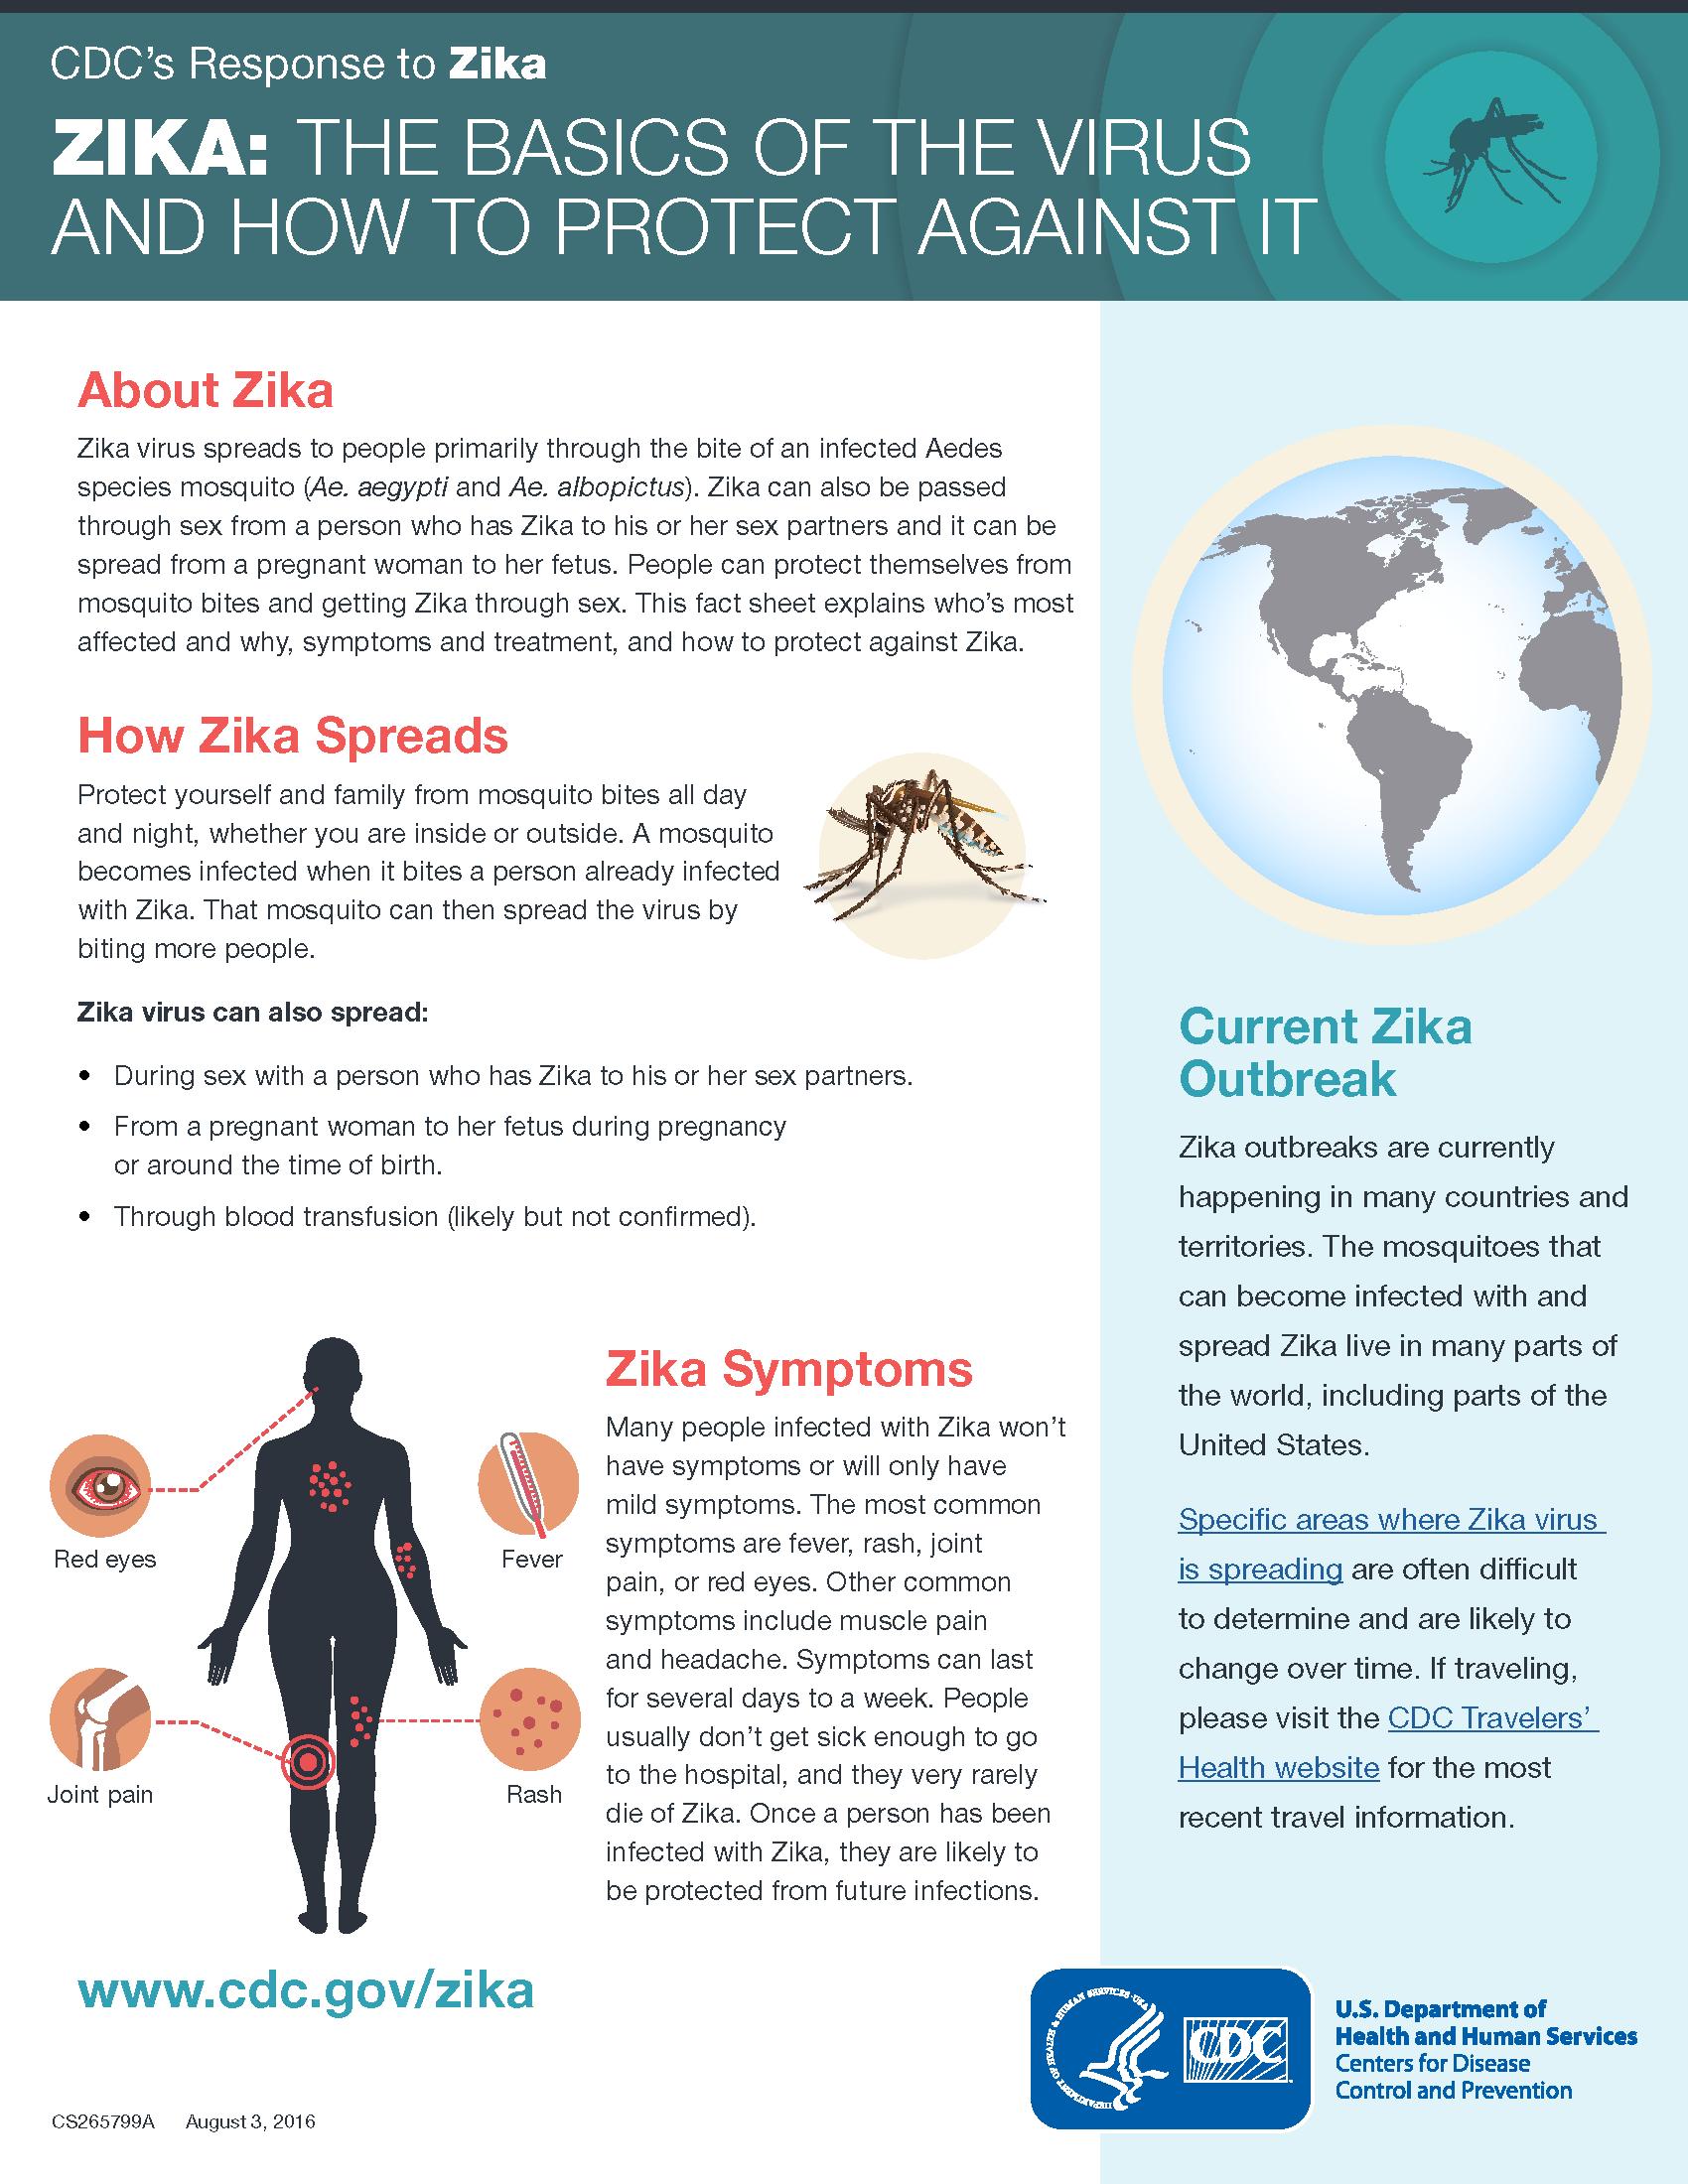 Zika Basics